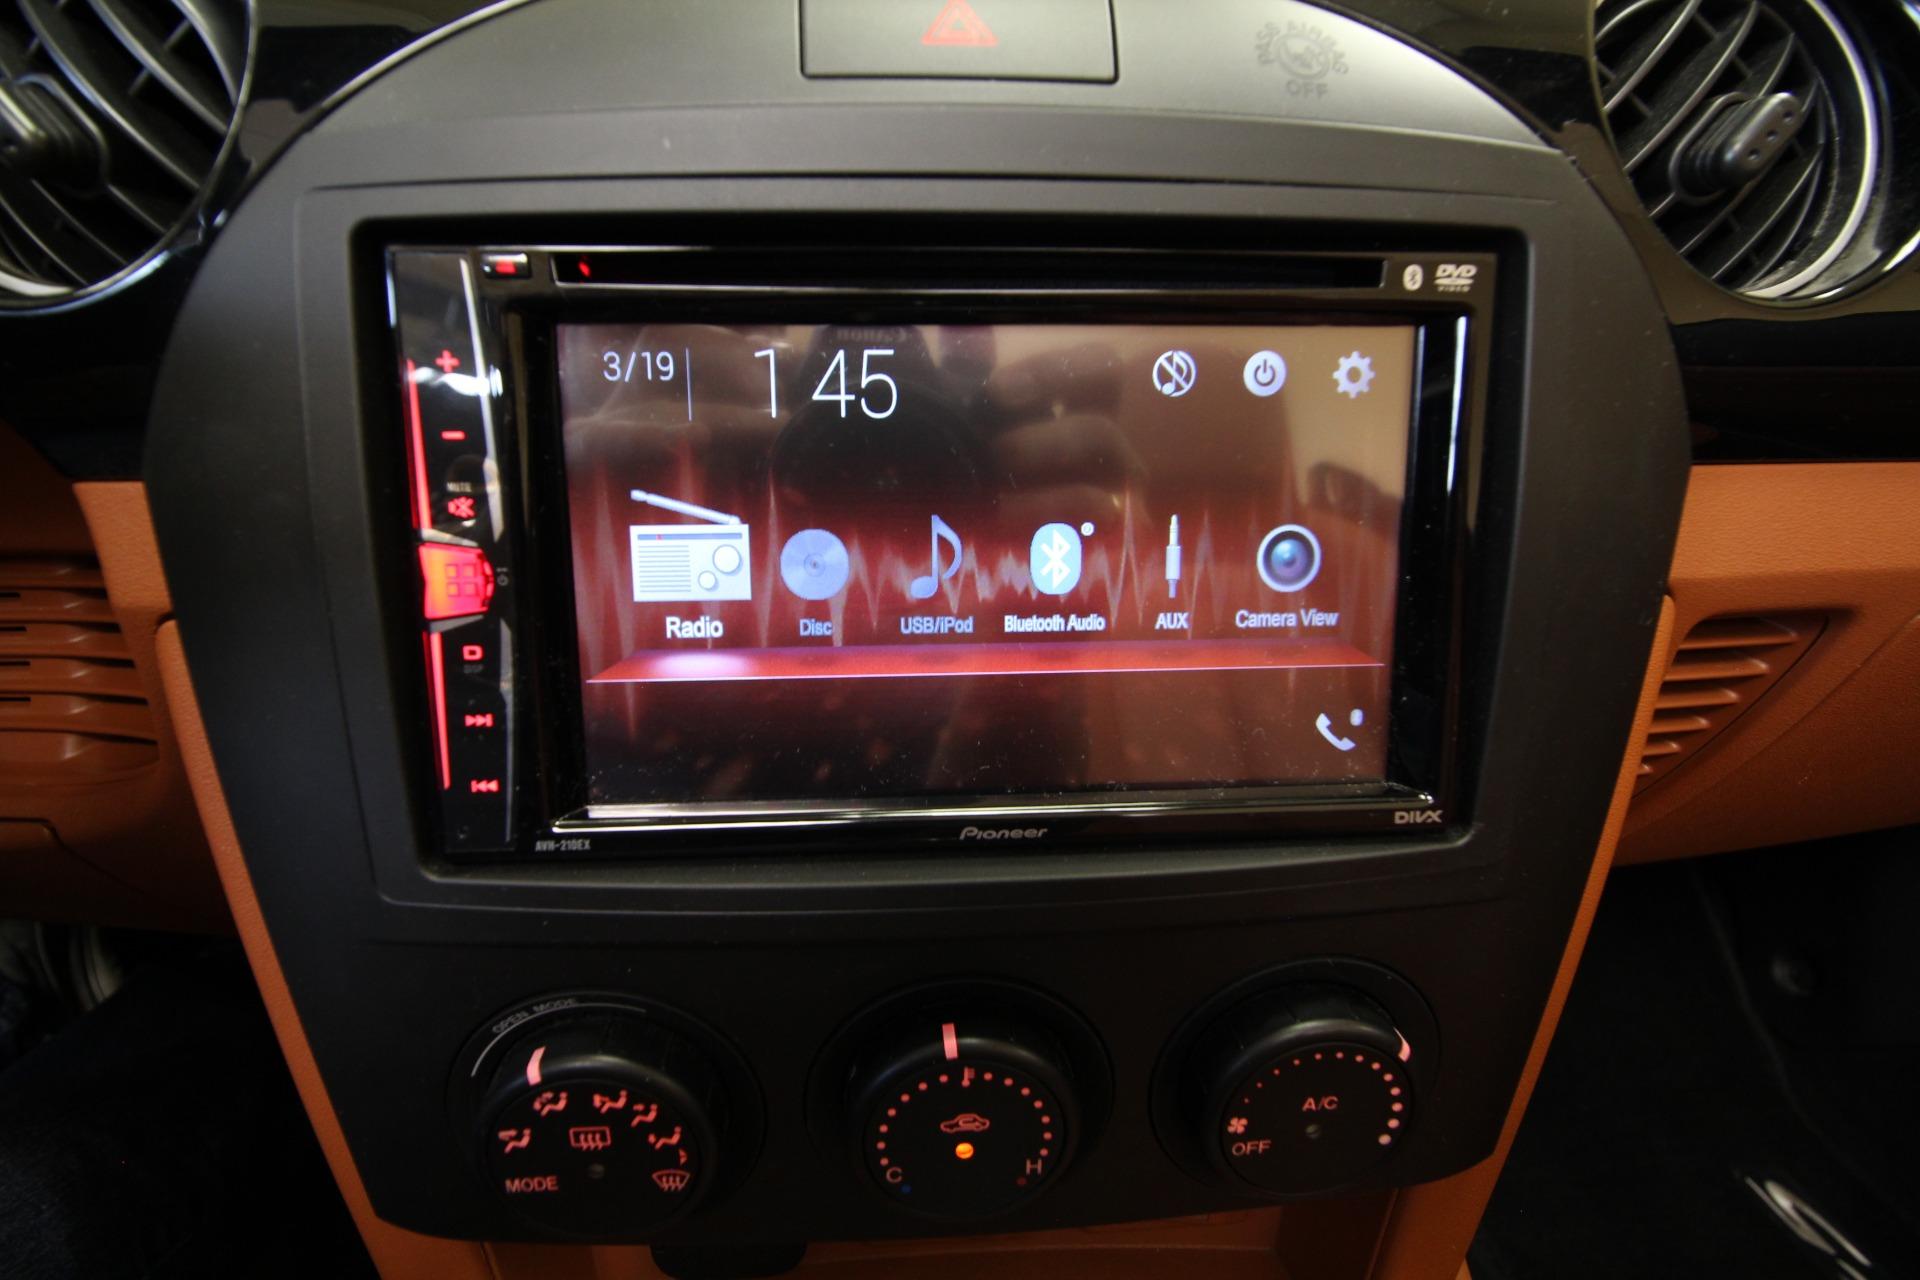 Used 2007 Mazda MX-5 Miata Grand Touring RARE 6 SPEED MANUAL LOW MILES SUPERB | Albany, NY